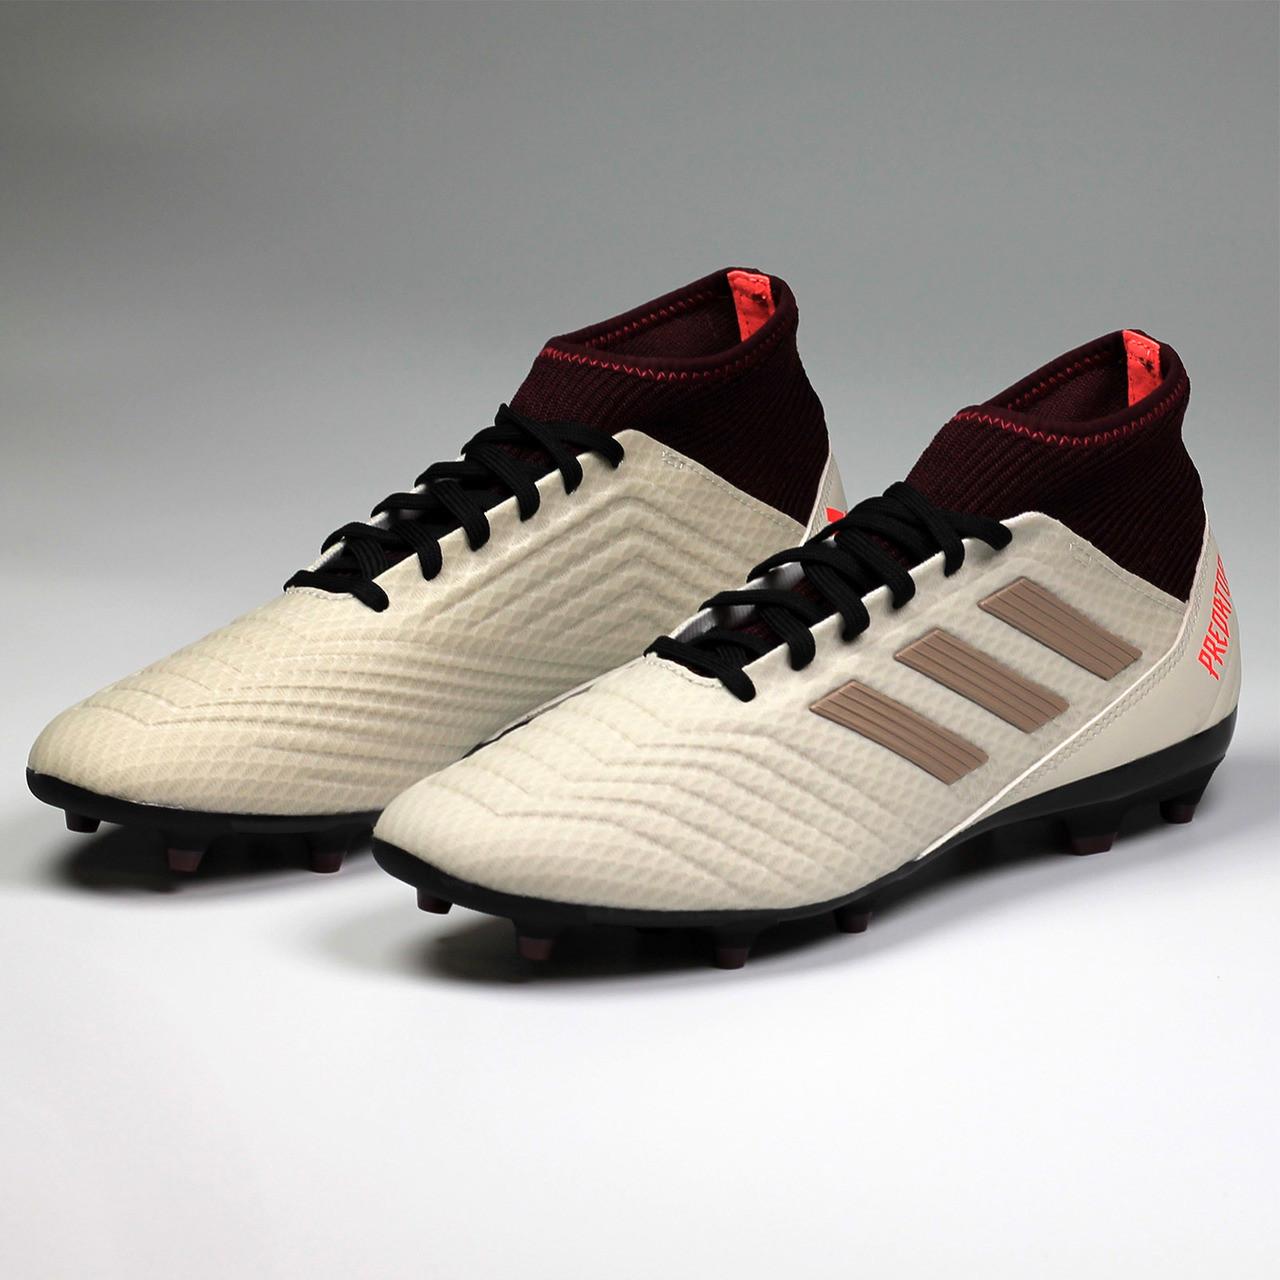 fa42c22a8 ... Adidas Predator 18.3 FG Women s Soccer Cleats DB2511. For Less